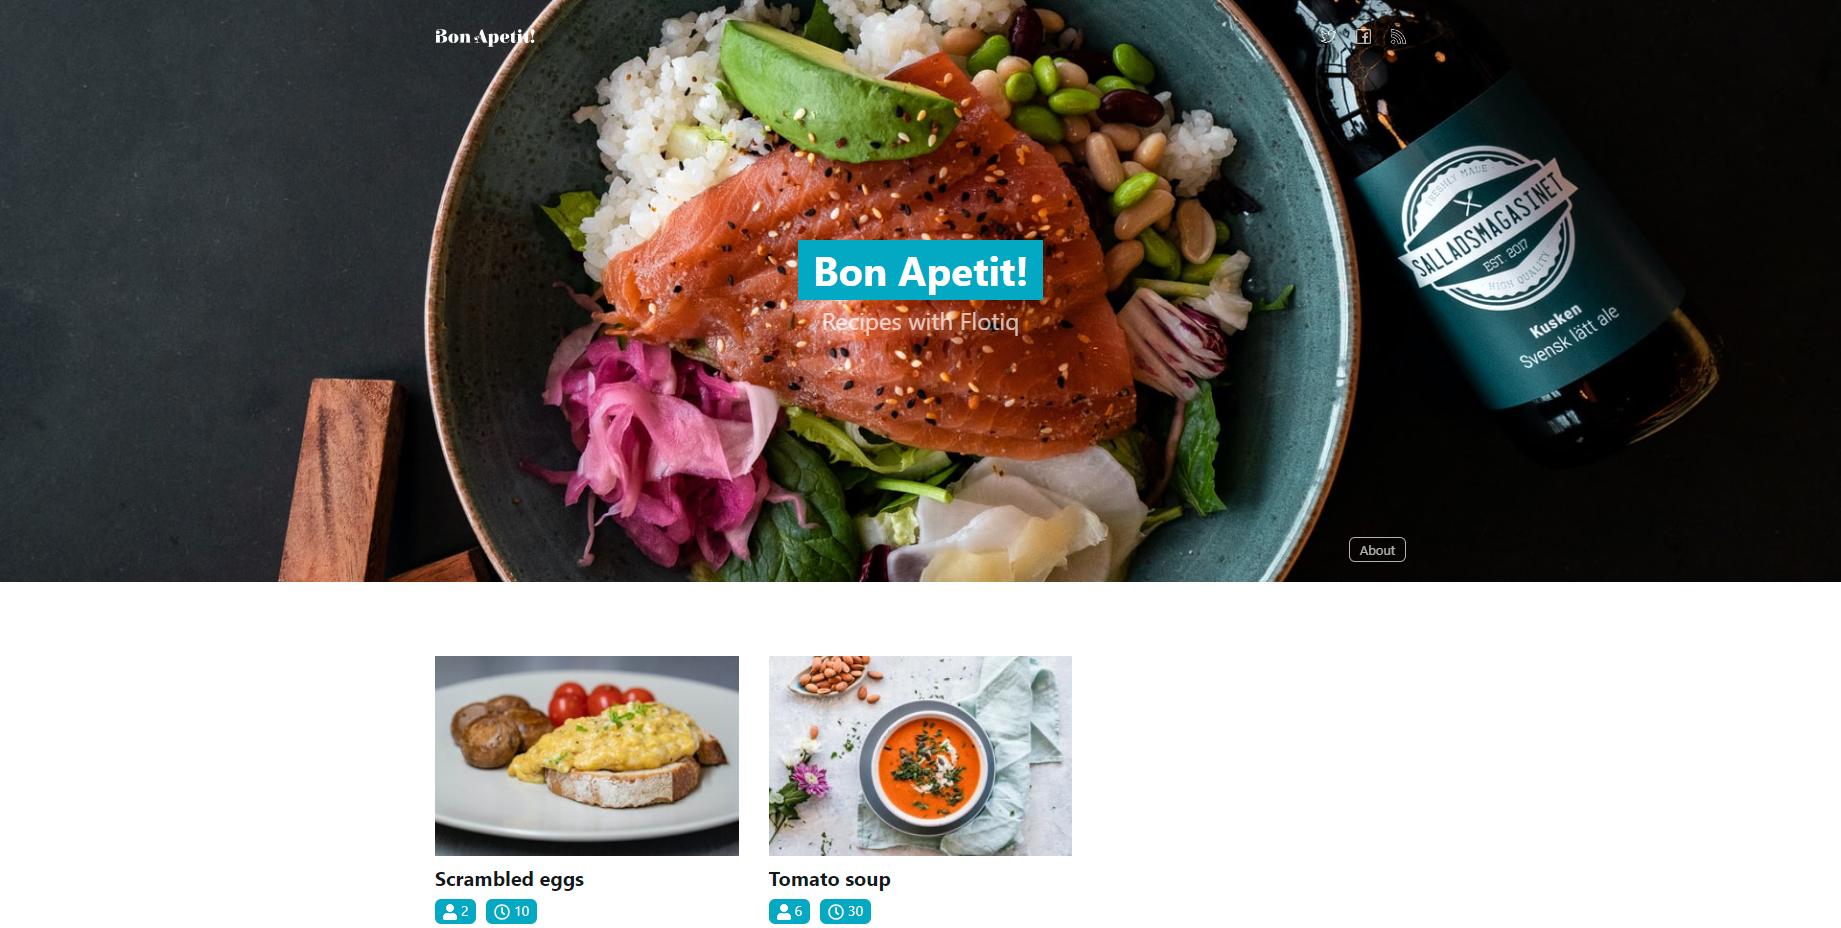 Recipes website built using Gatsby and Flotiq